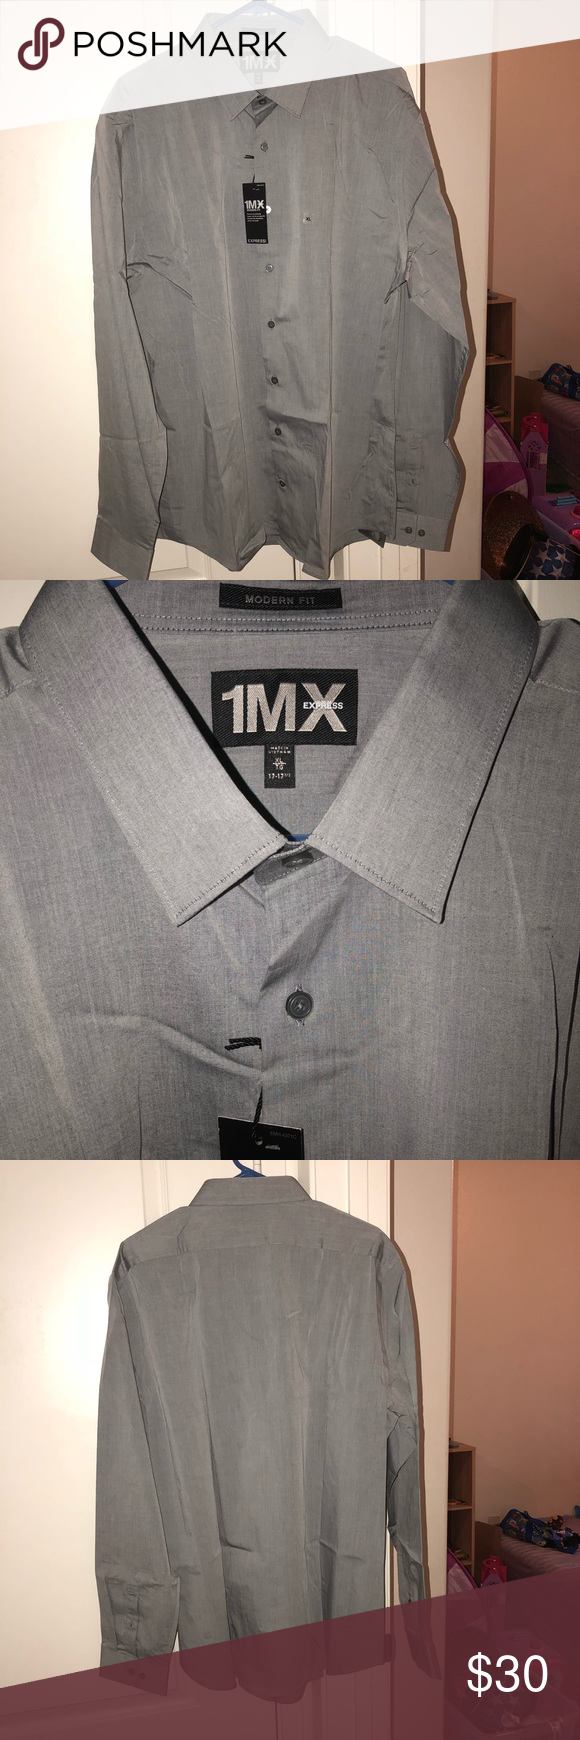 Menus express mx long sleeve shirt long sleeve dress shirt